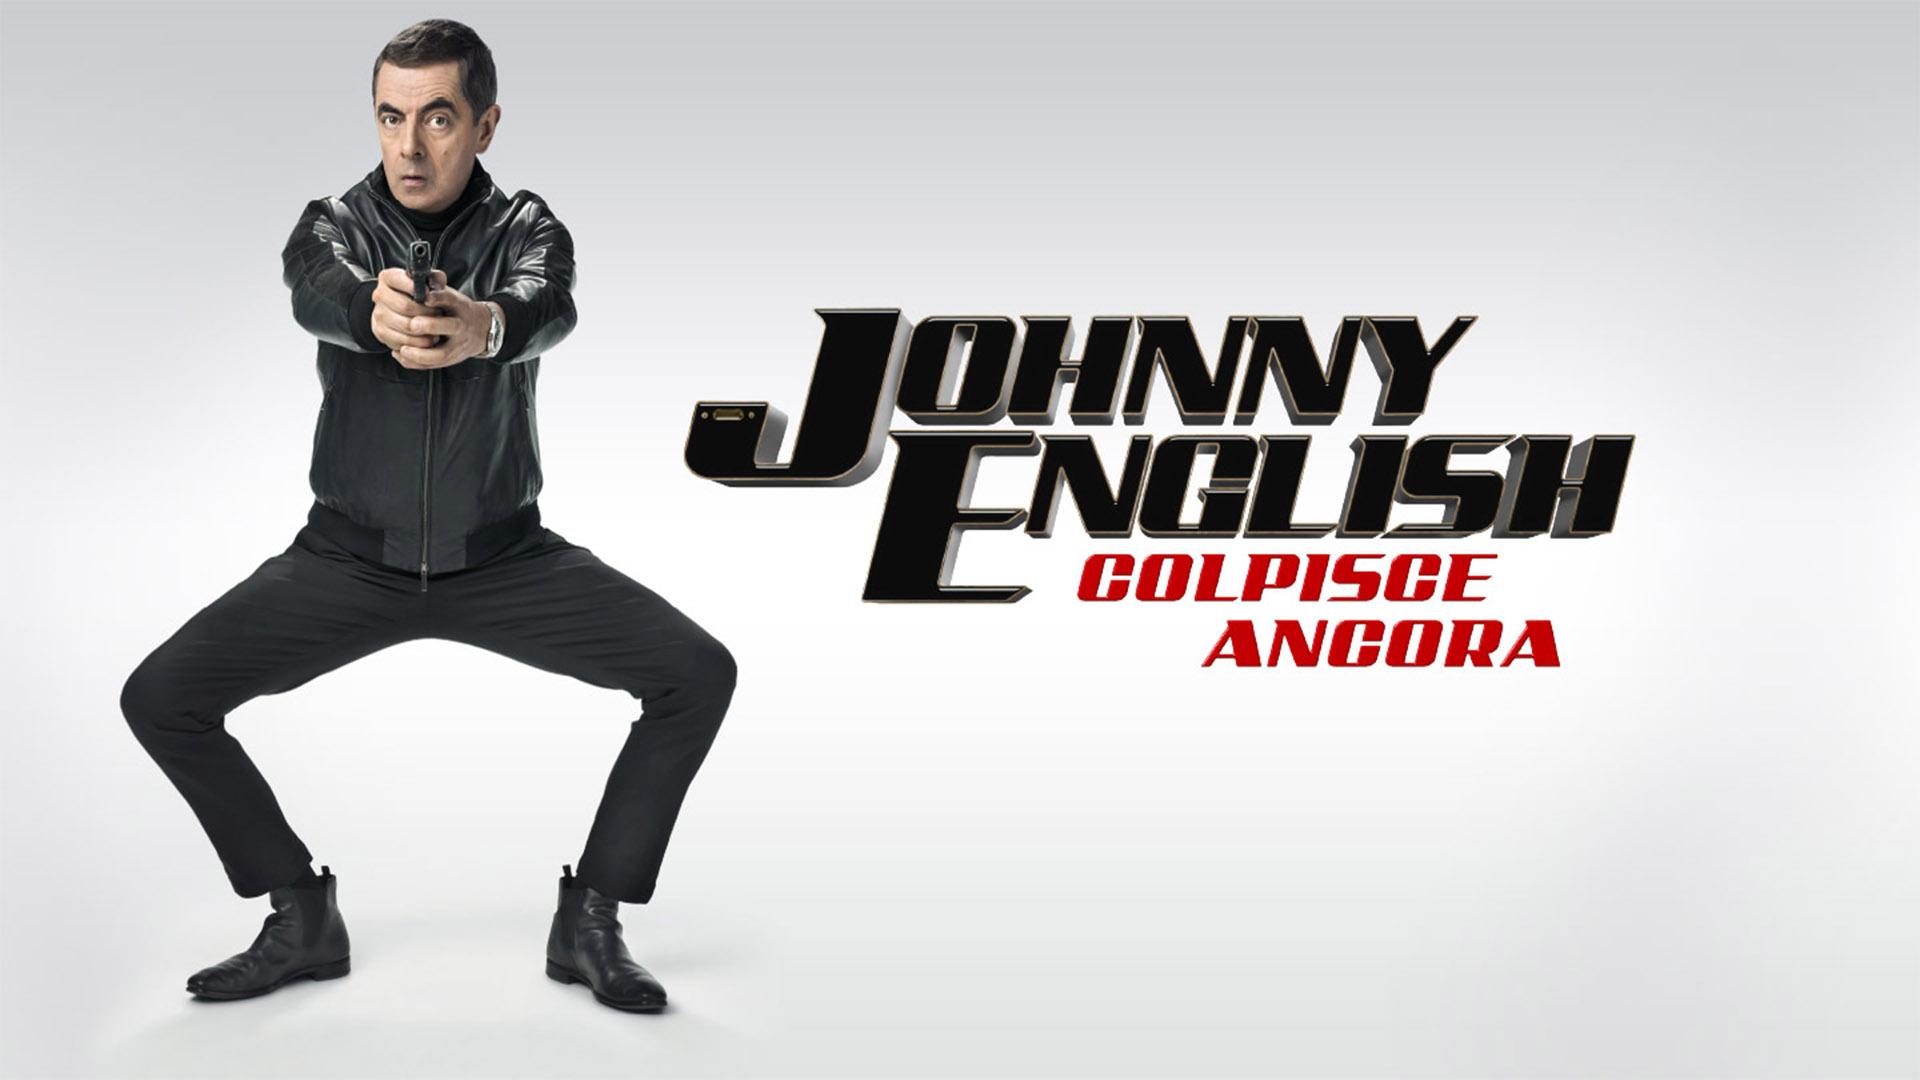 johnny-english-colpisce-ancora-sky-cinema-giugno-2019